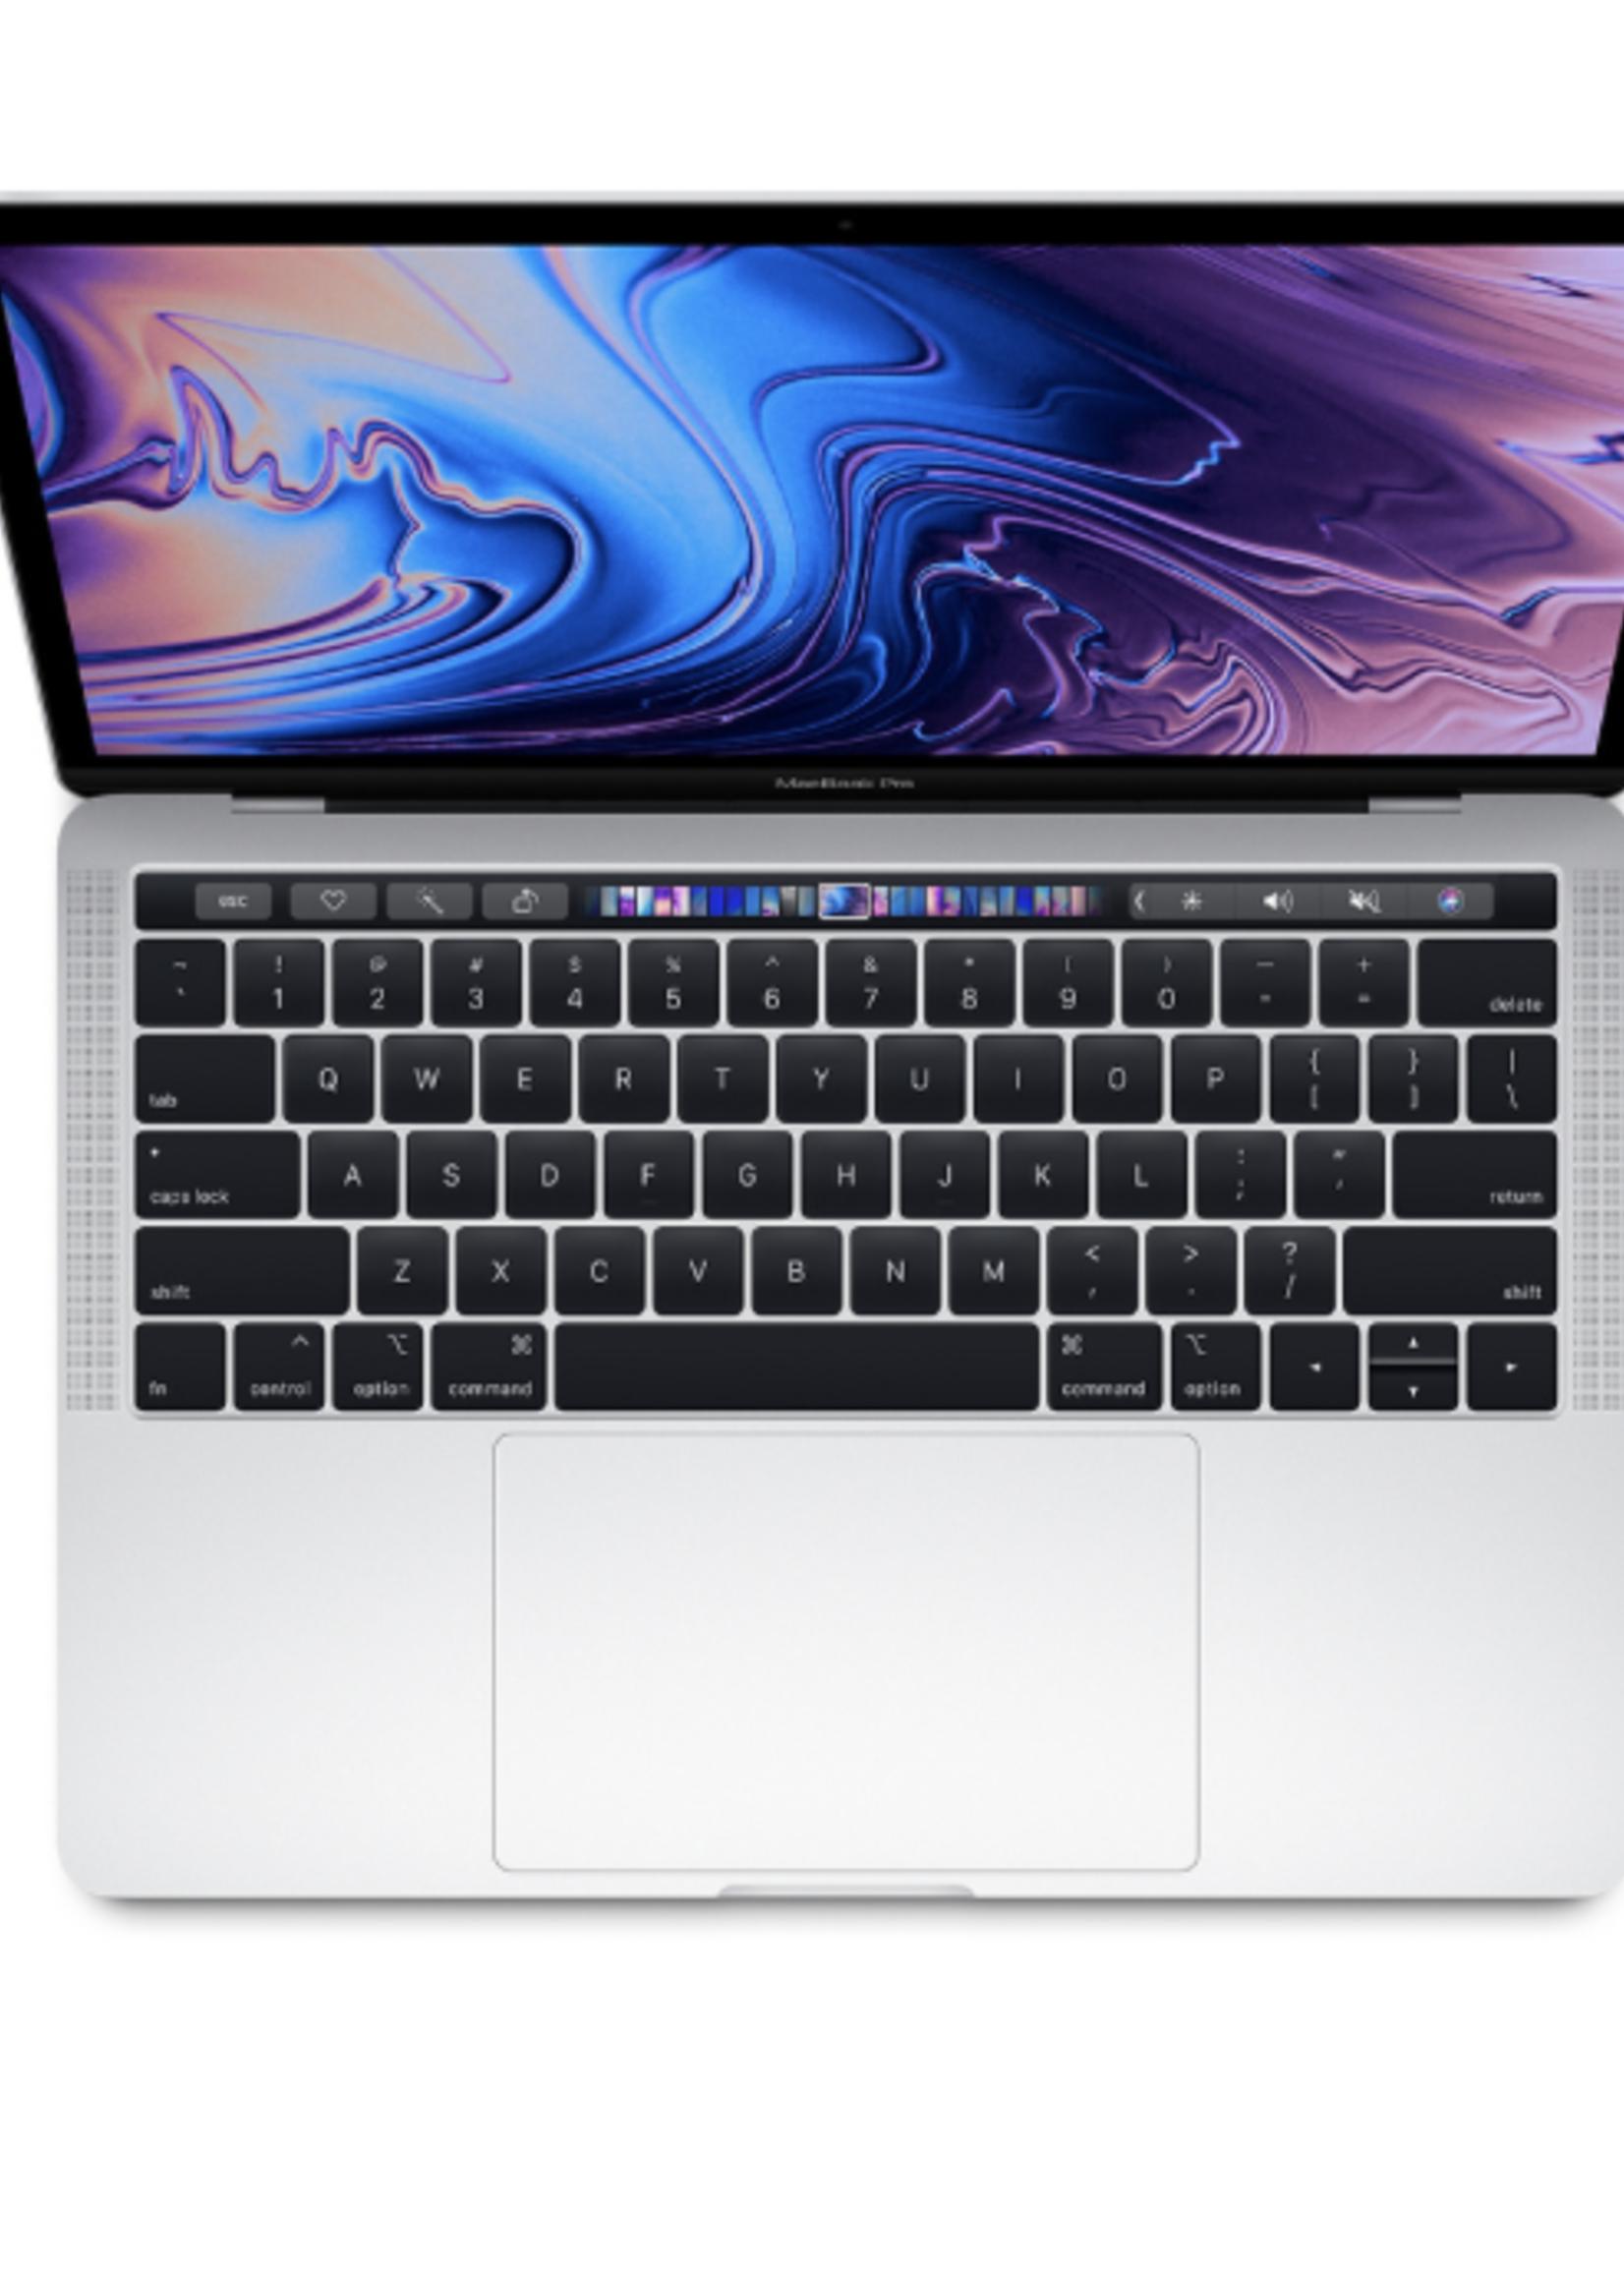 "13"" Macbook Pro w/ touch - 128GB - Silver"